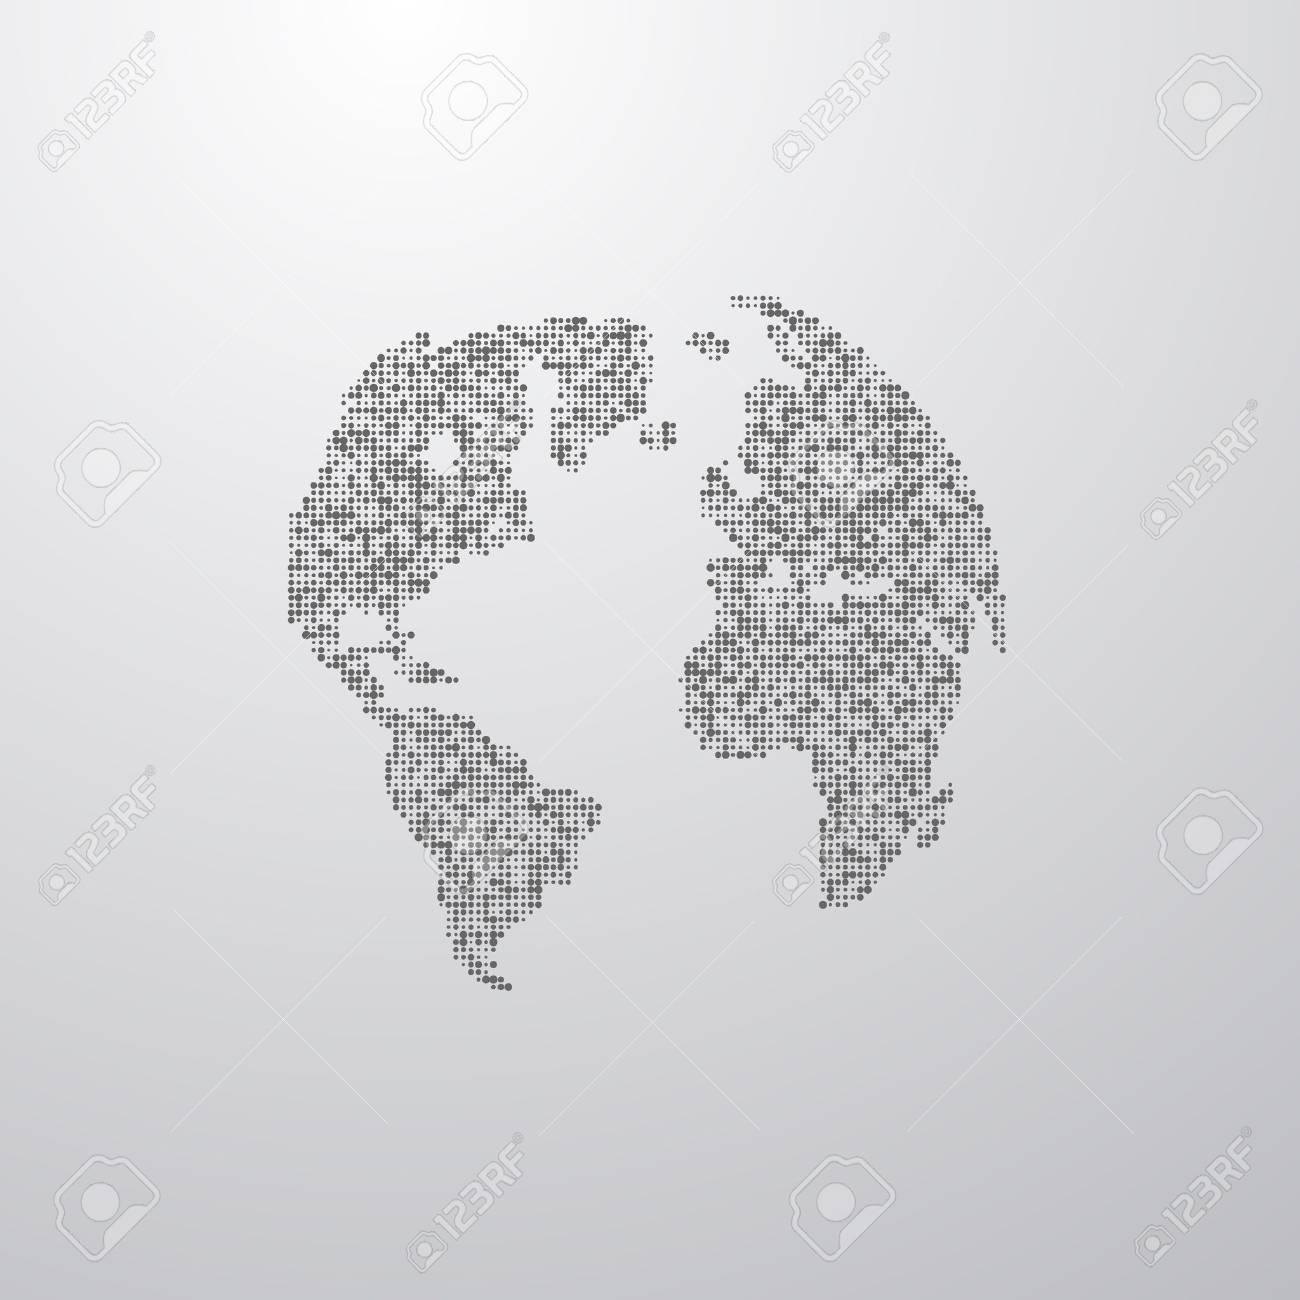 Vector Illustration Of A World Map. Globe Label Design. World ...